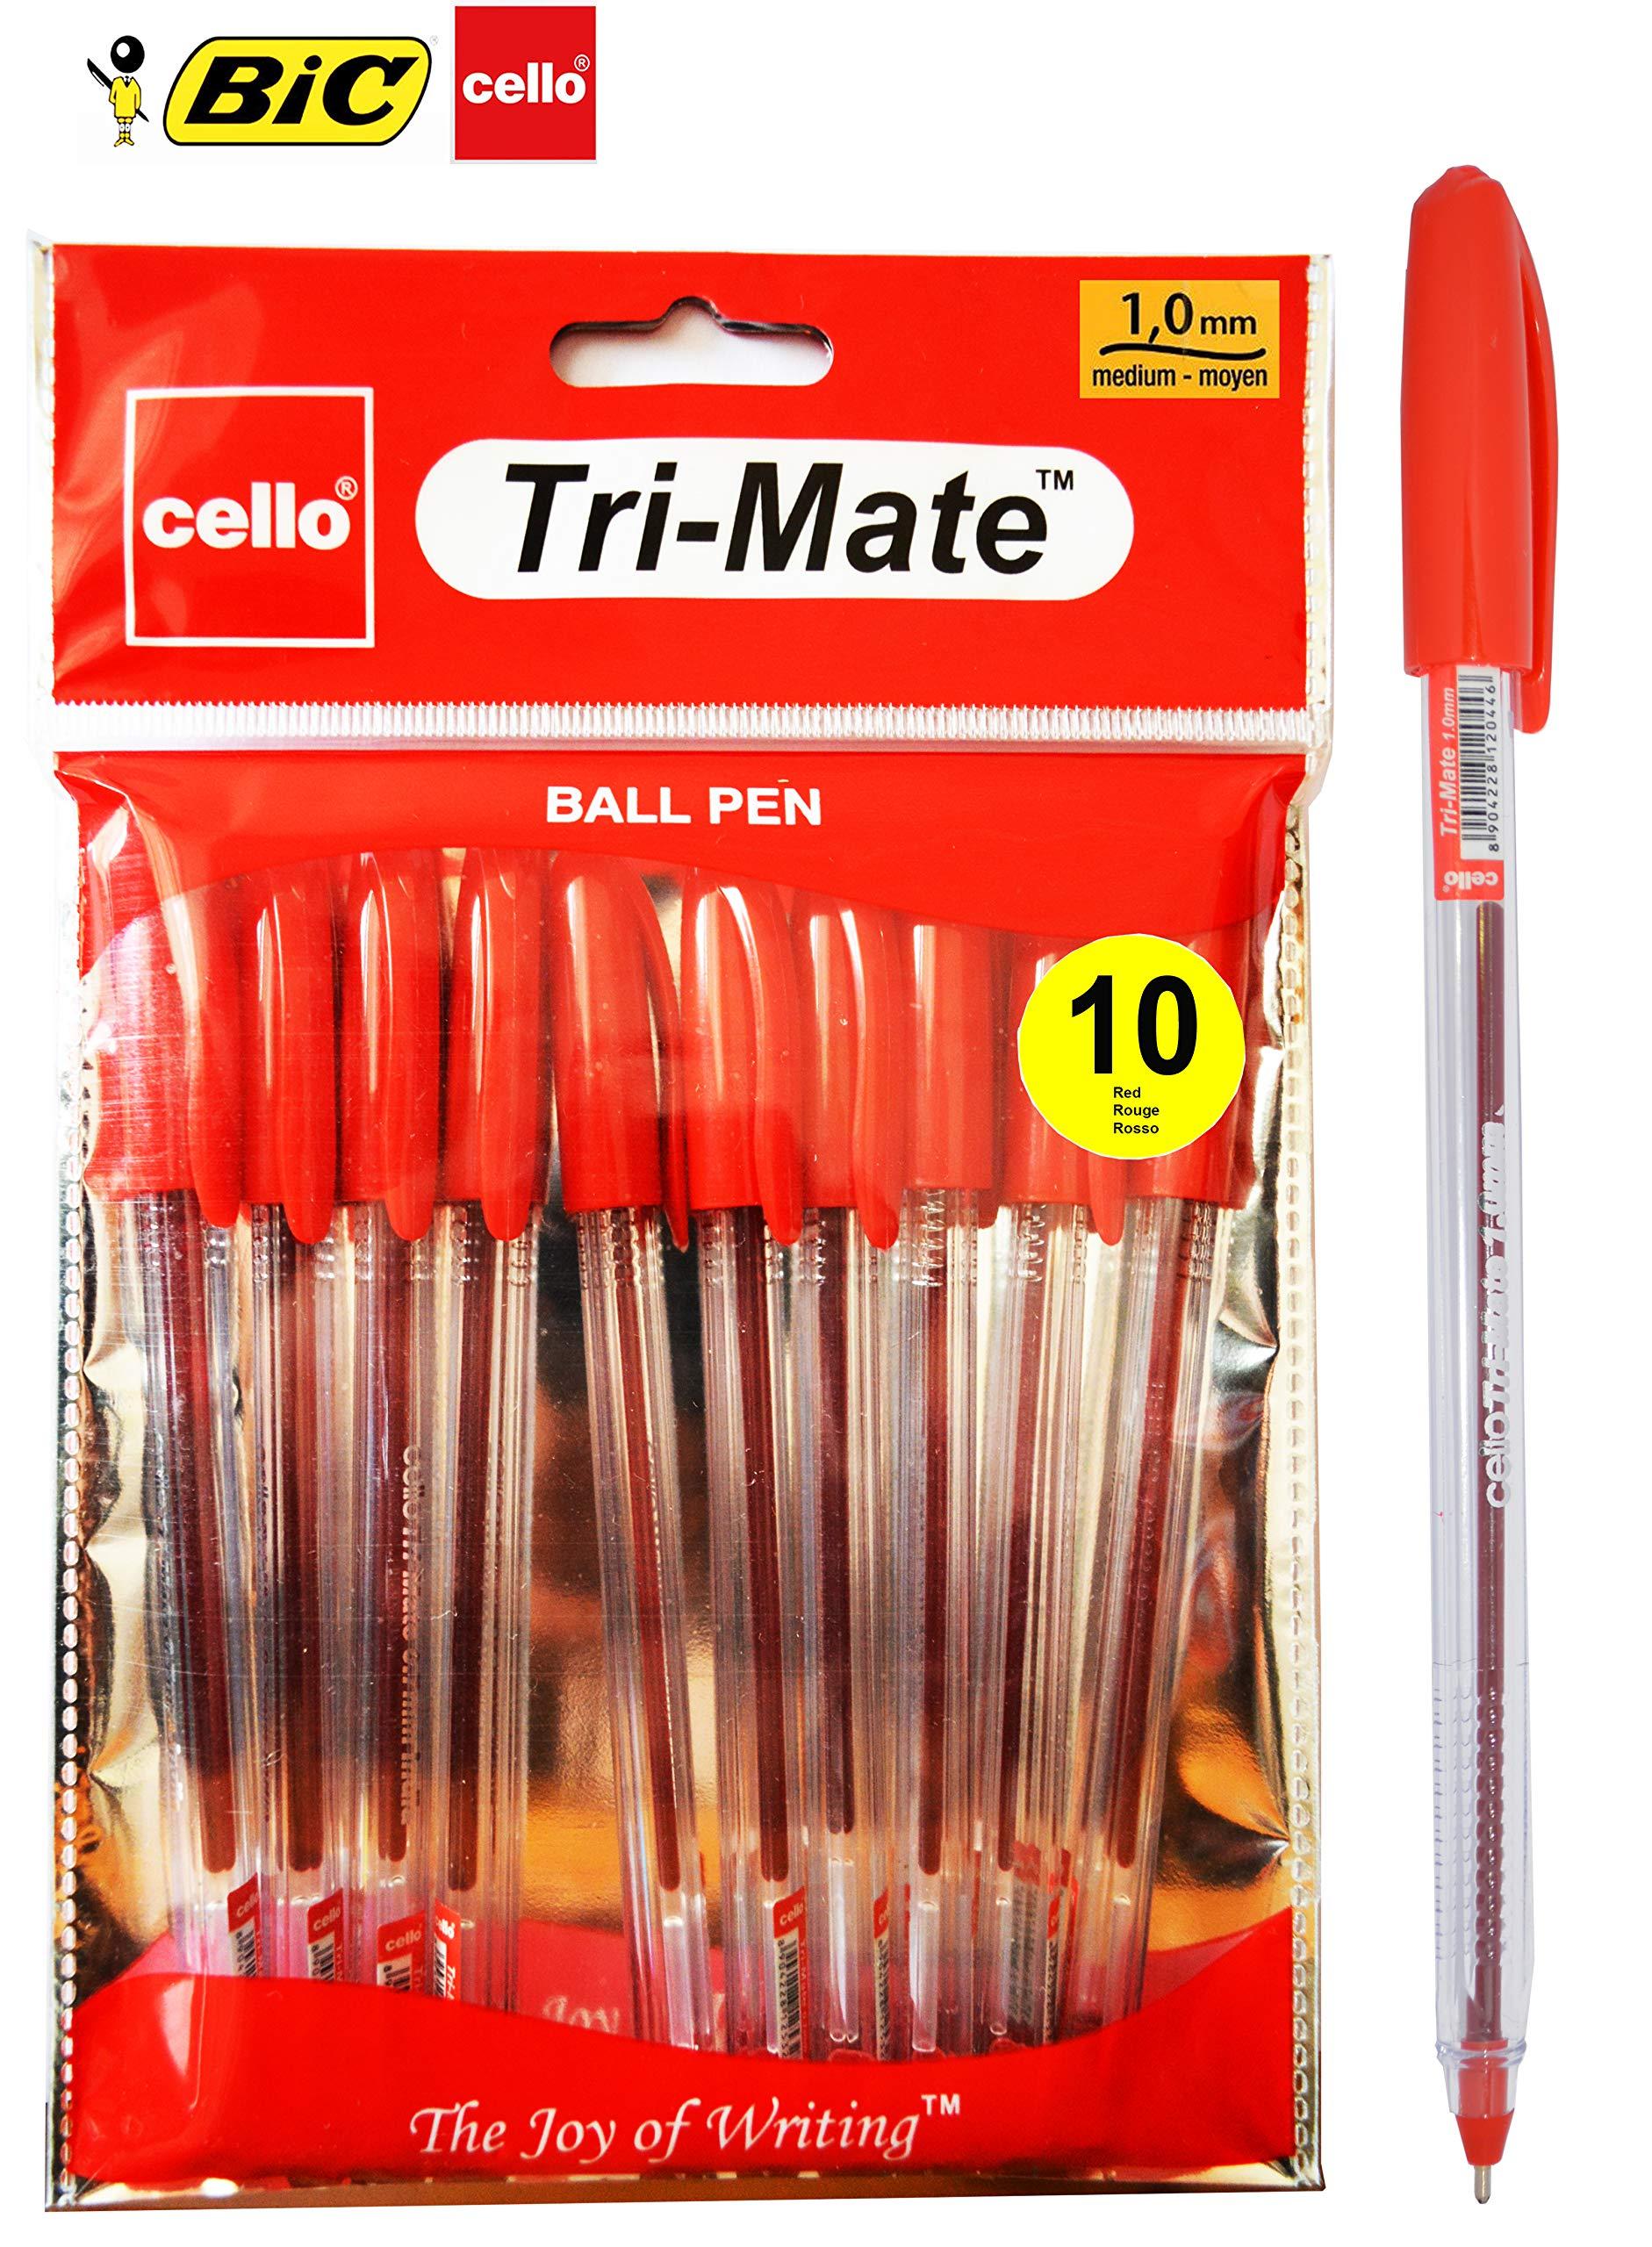 BIC Cello Tri-Mate Cristal Ballpoint Pens Medium Point Pack of 10 Black